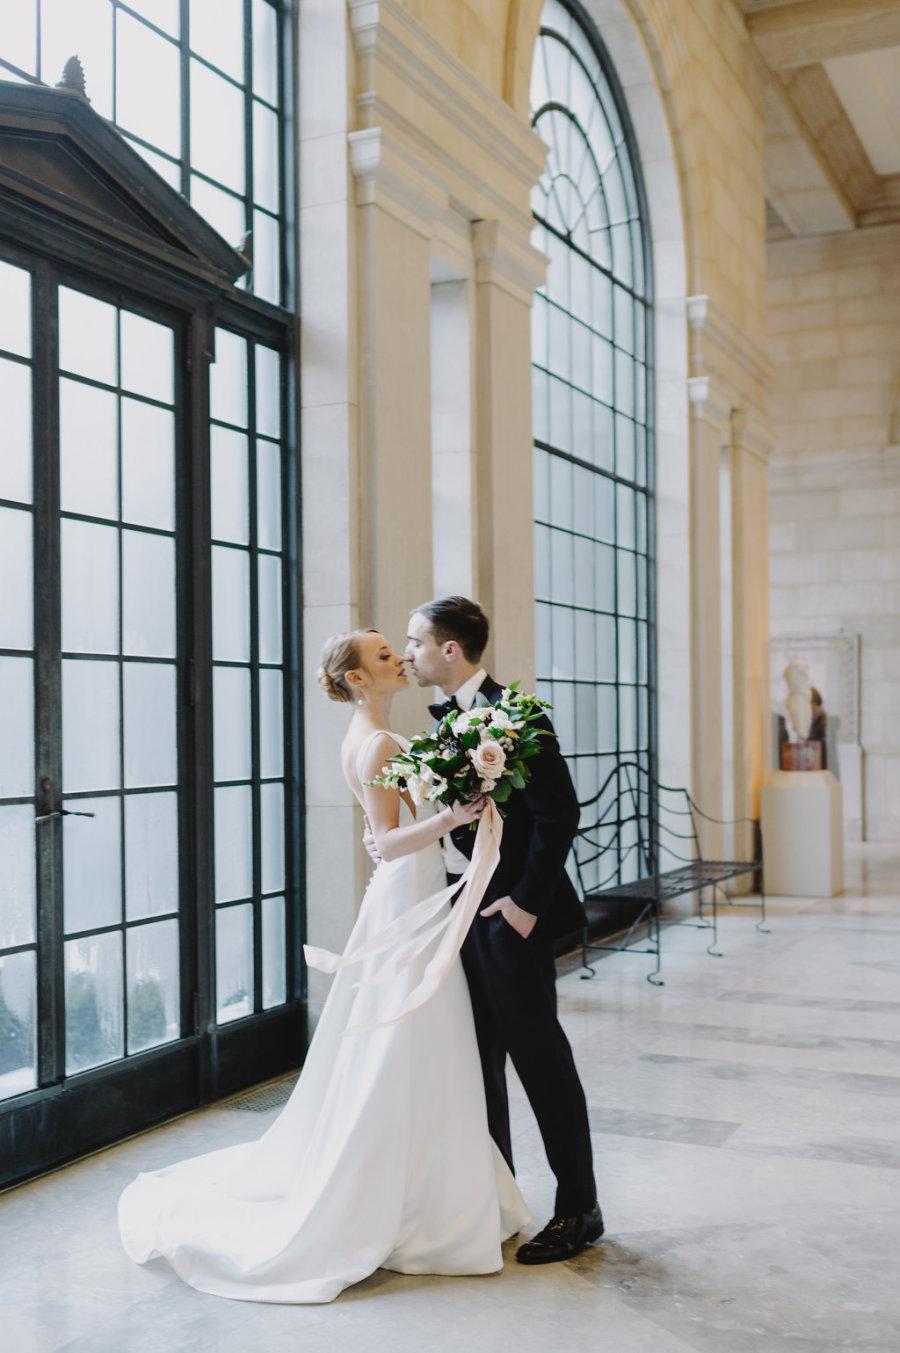 Sophie felts blossom and vine wedding florist washington dc